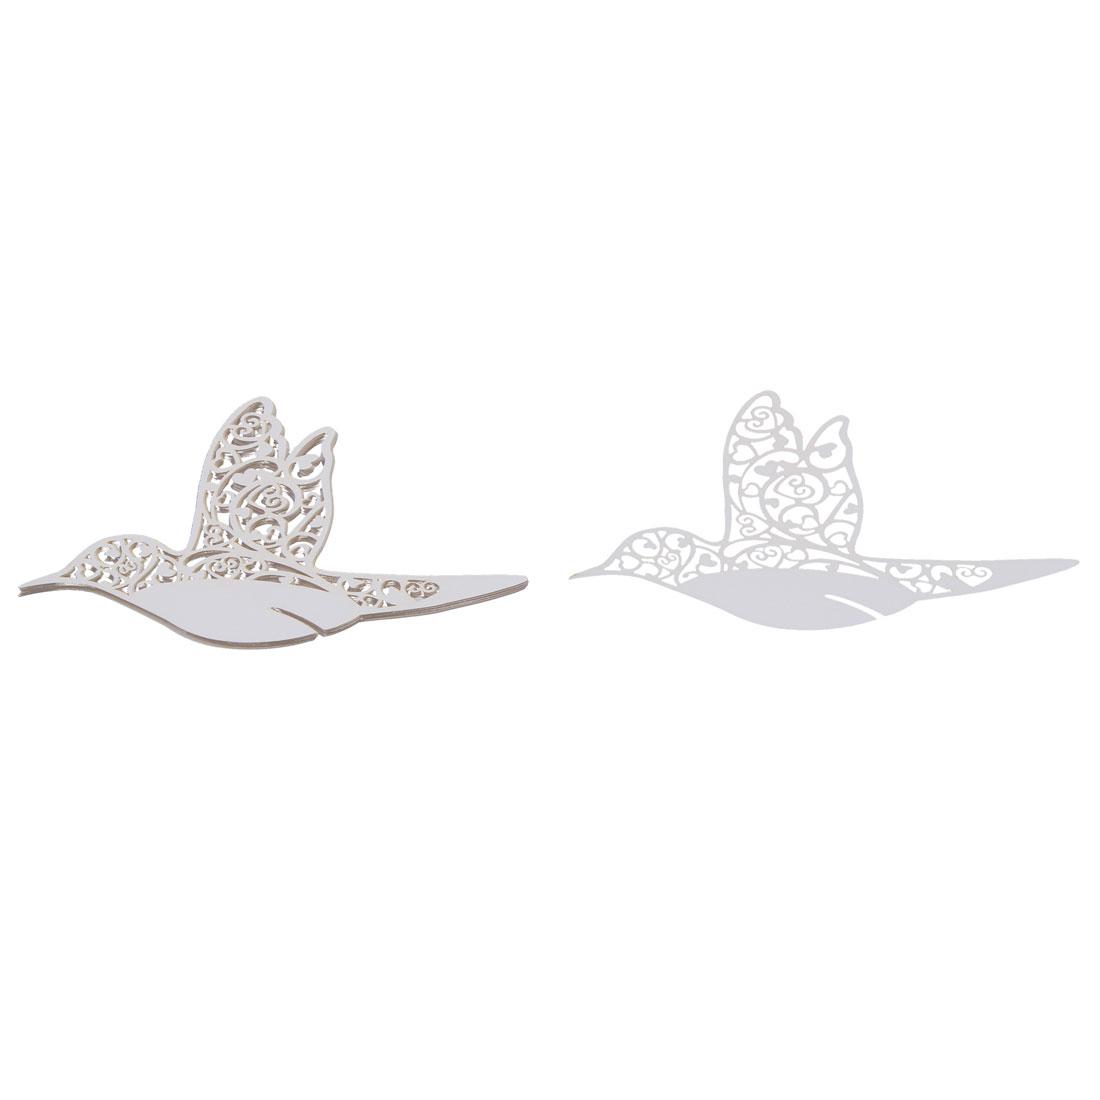 Wedding Decor Laser Cut Humming Birds Shaped Table Name Wine Glass Cards White 10 PCS